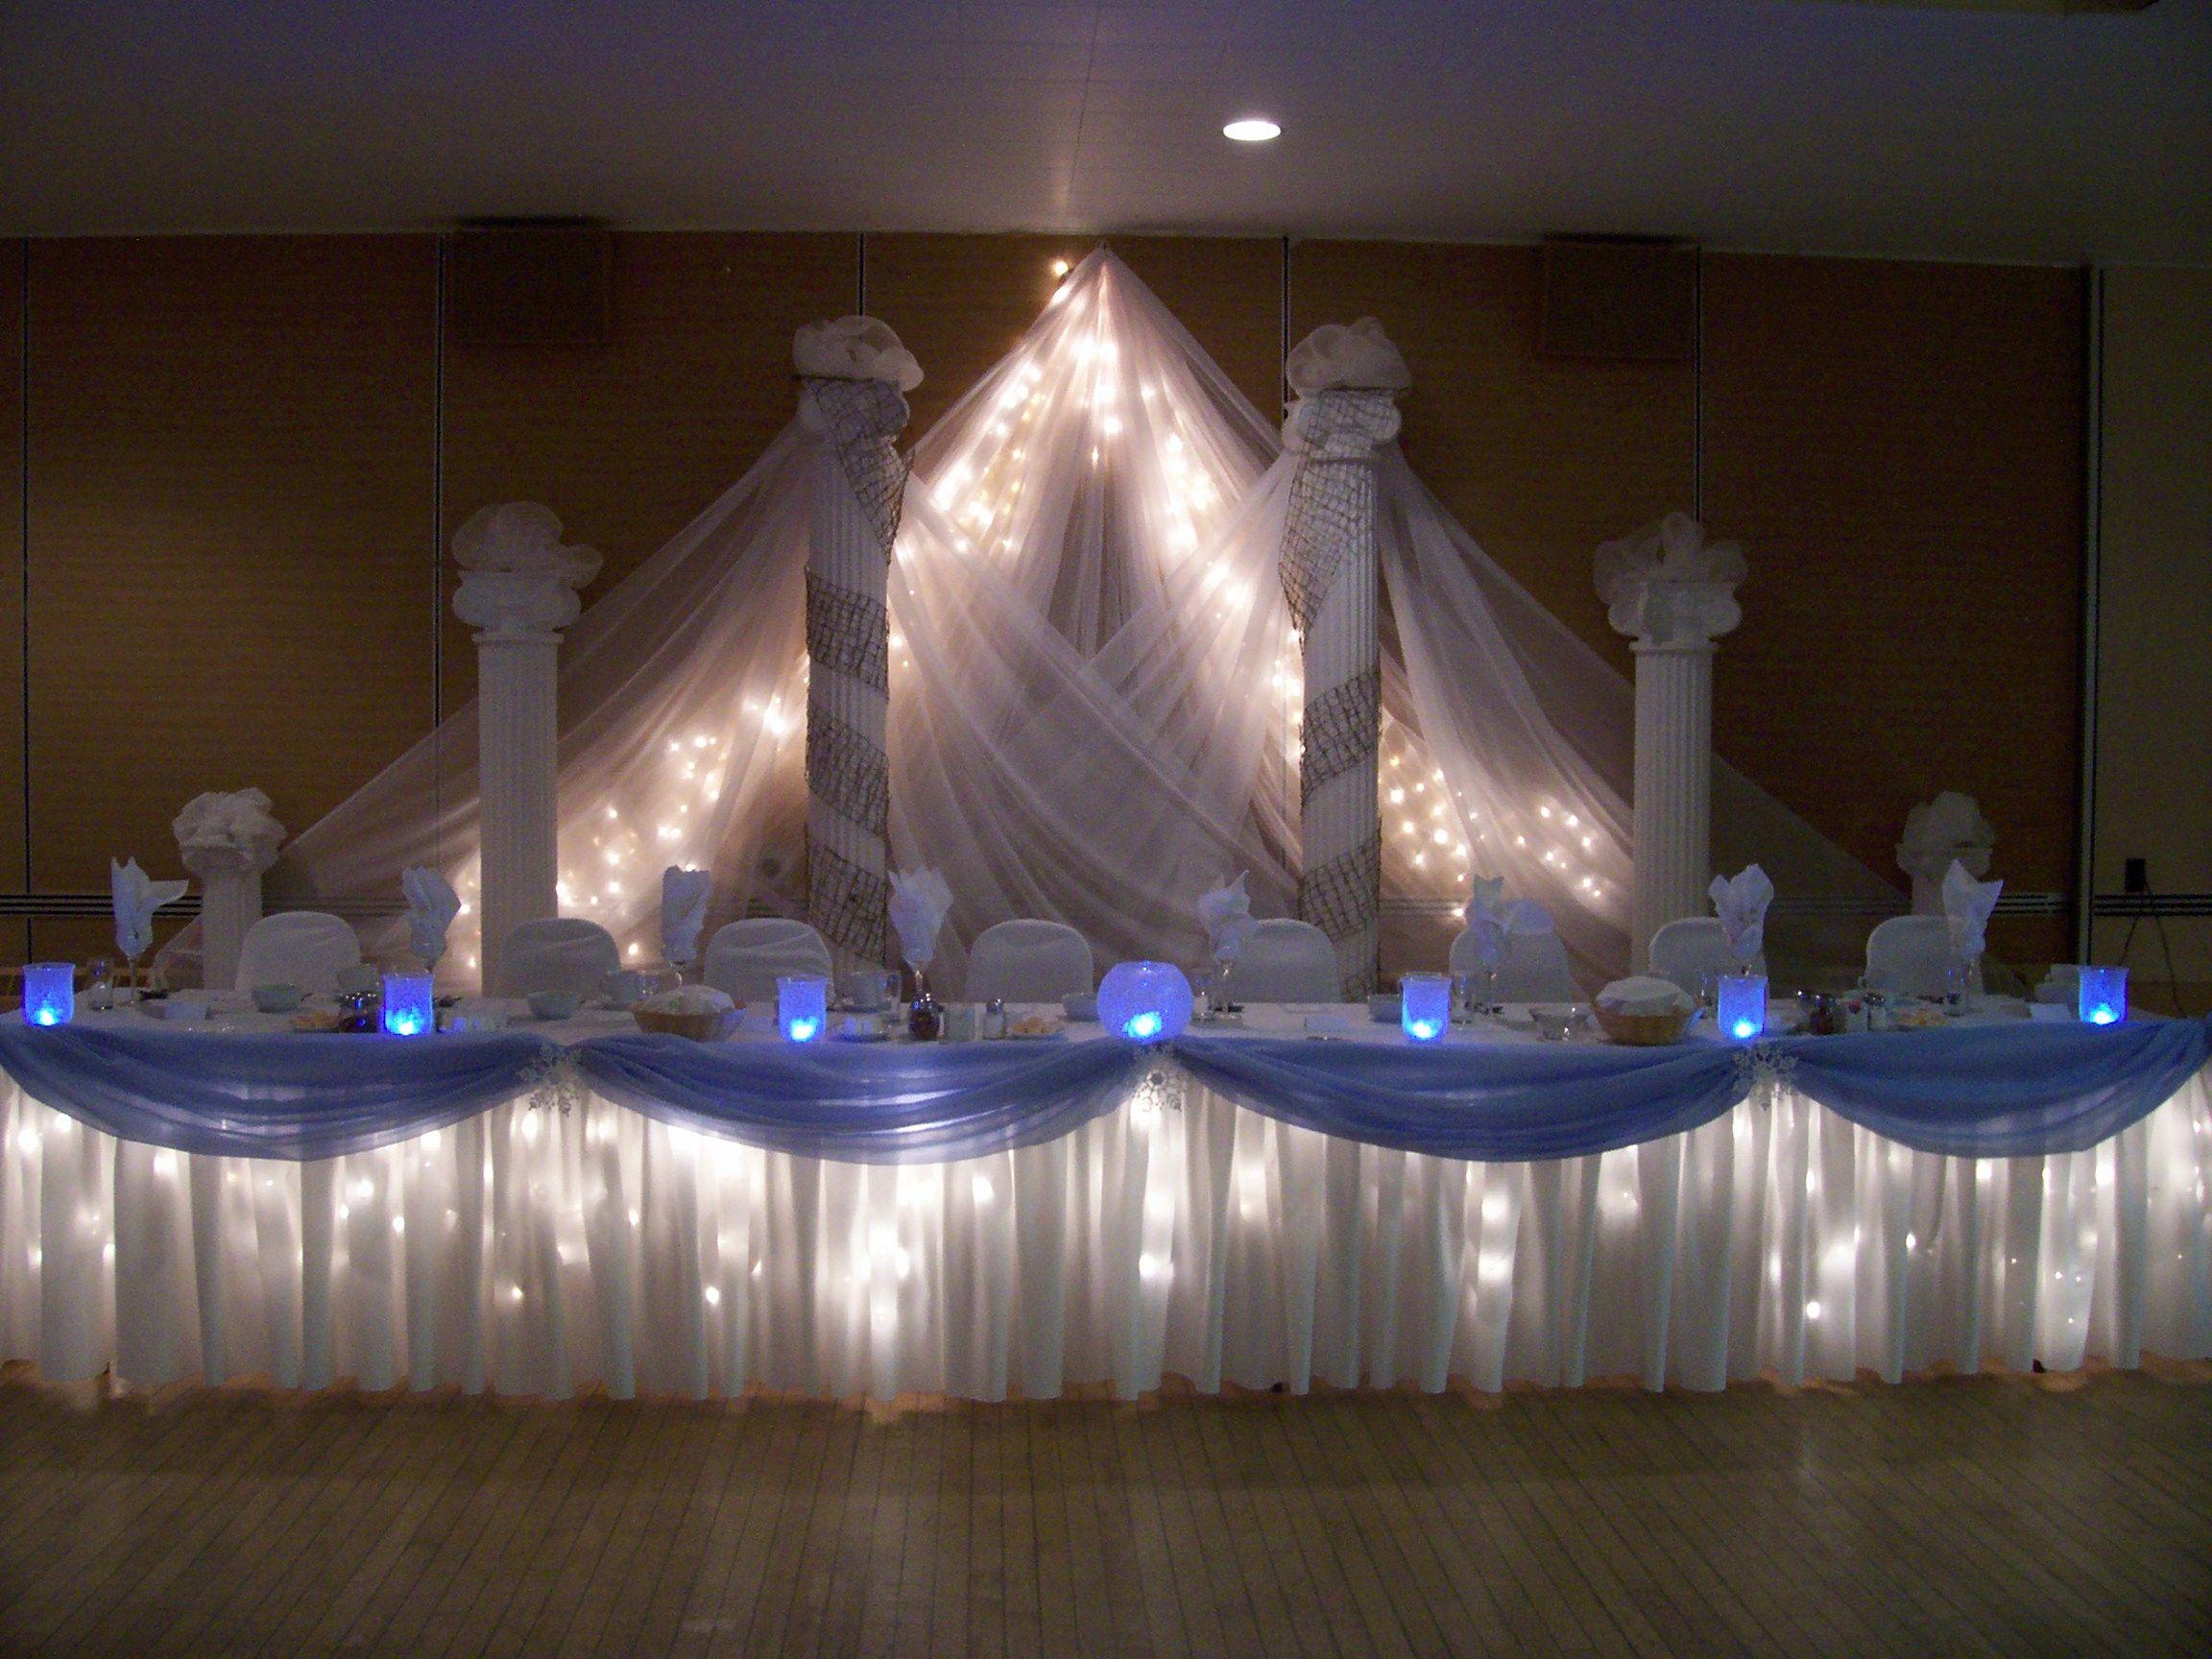 winter wonderland wedding decor winter wonderland. Black Bedroom Furniture Sets. Home Design Ideas